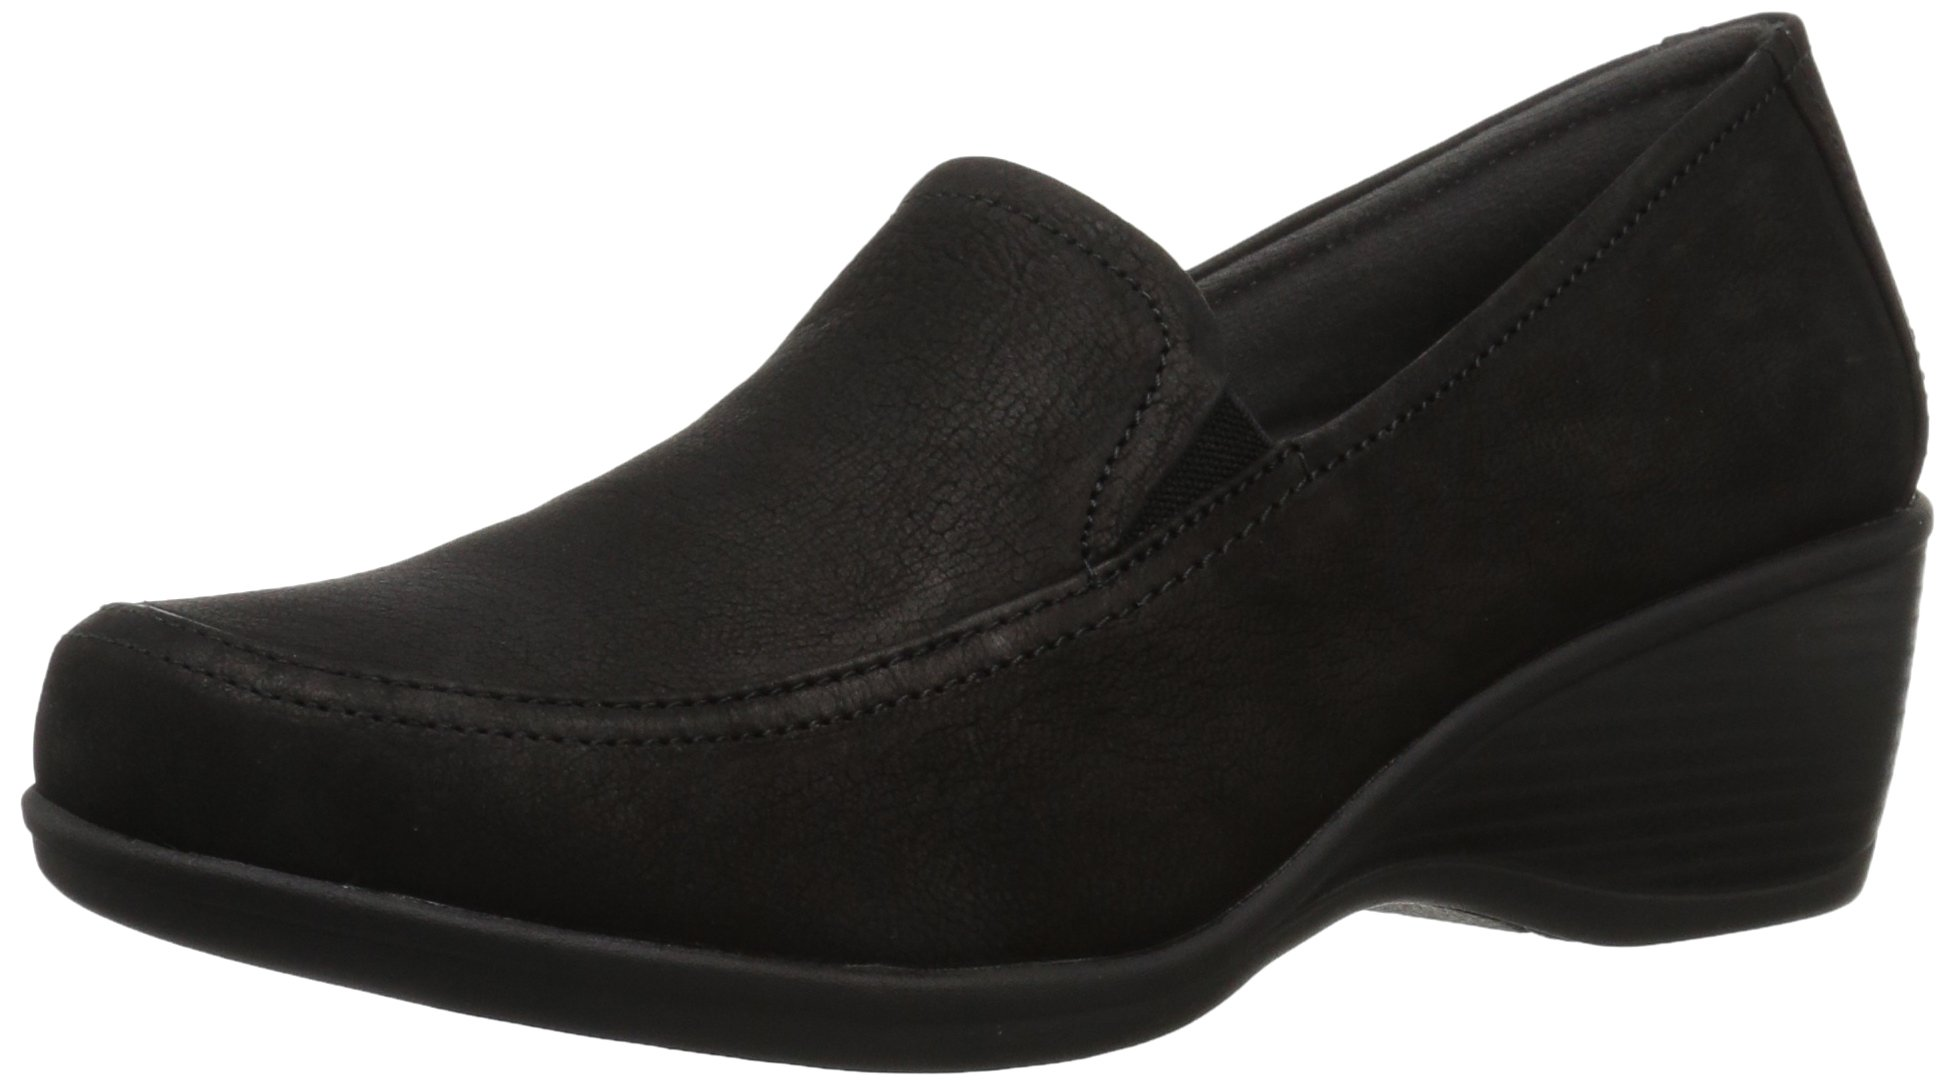 Eastland Women's Cora Slip-On Wedge, Black, 7 Medium US